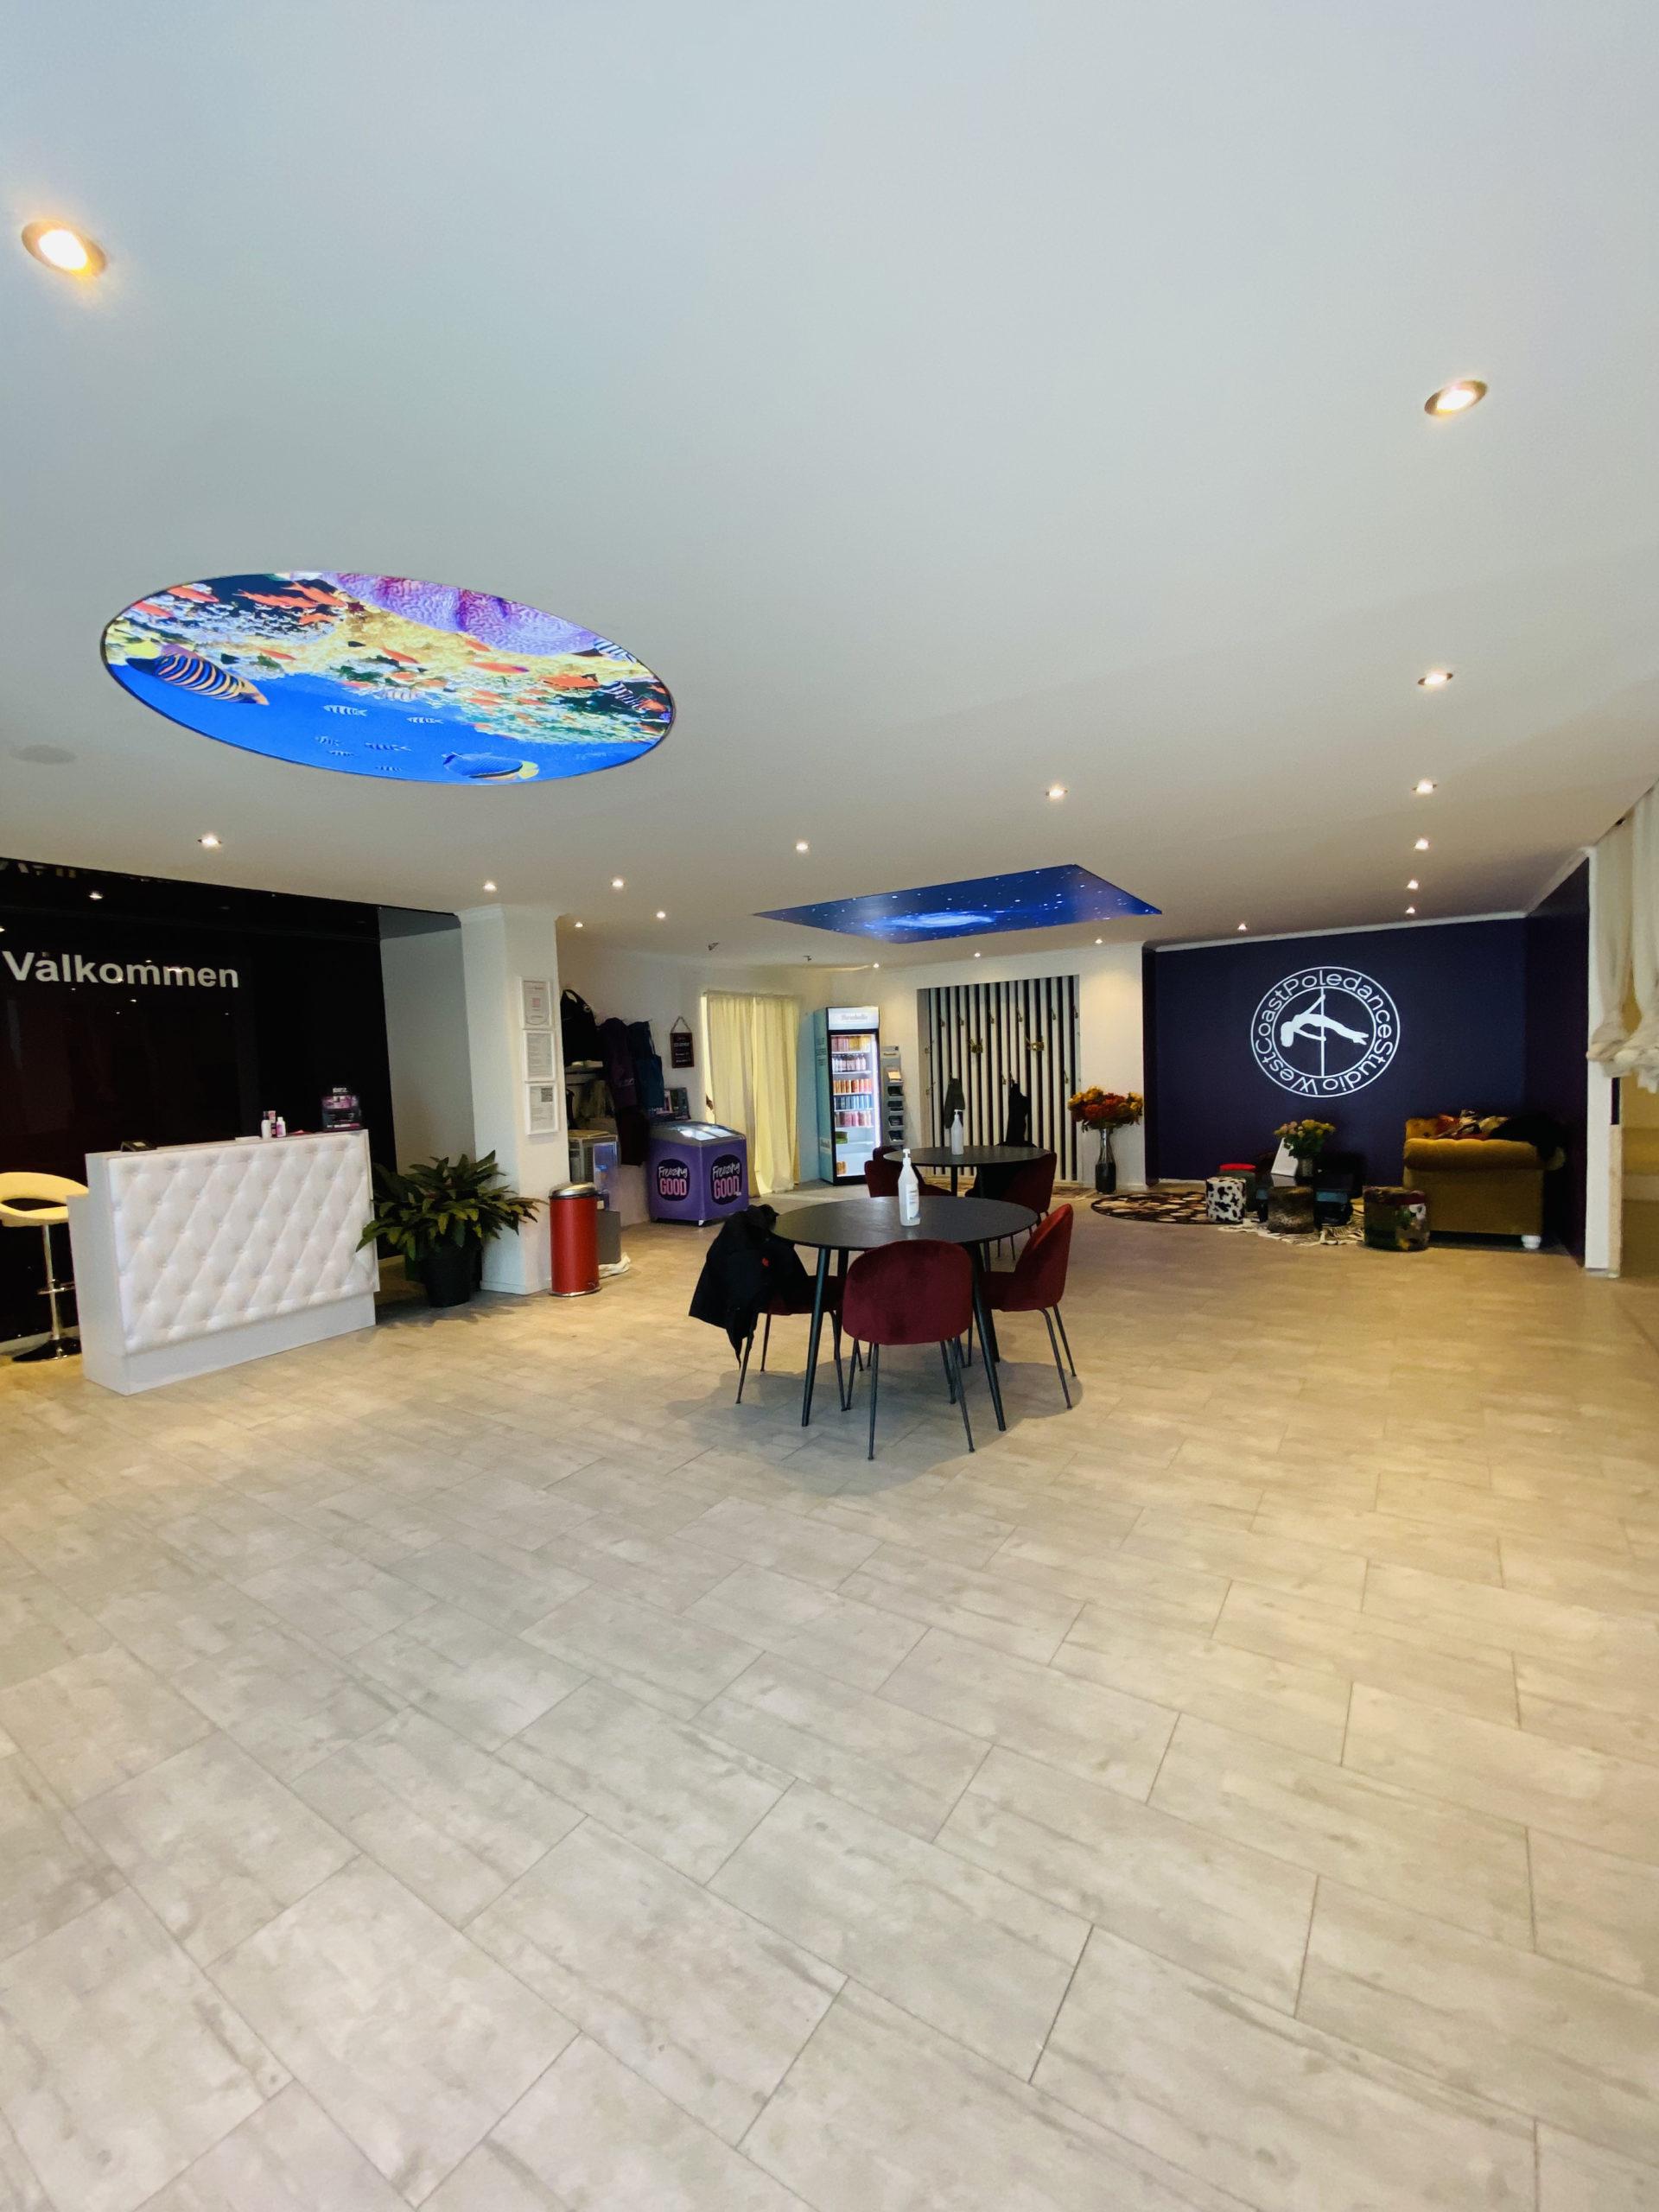 West Coast Poledance Studio Göteborg Lobbyn